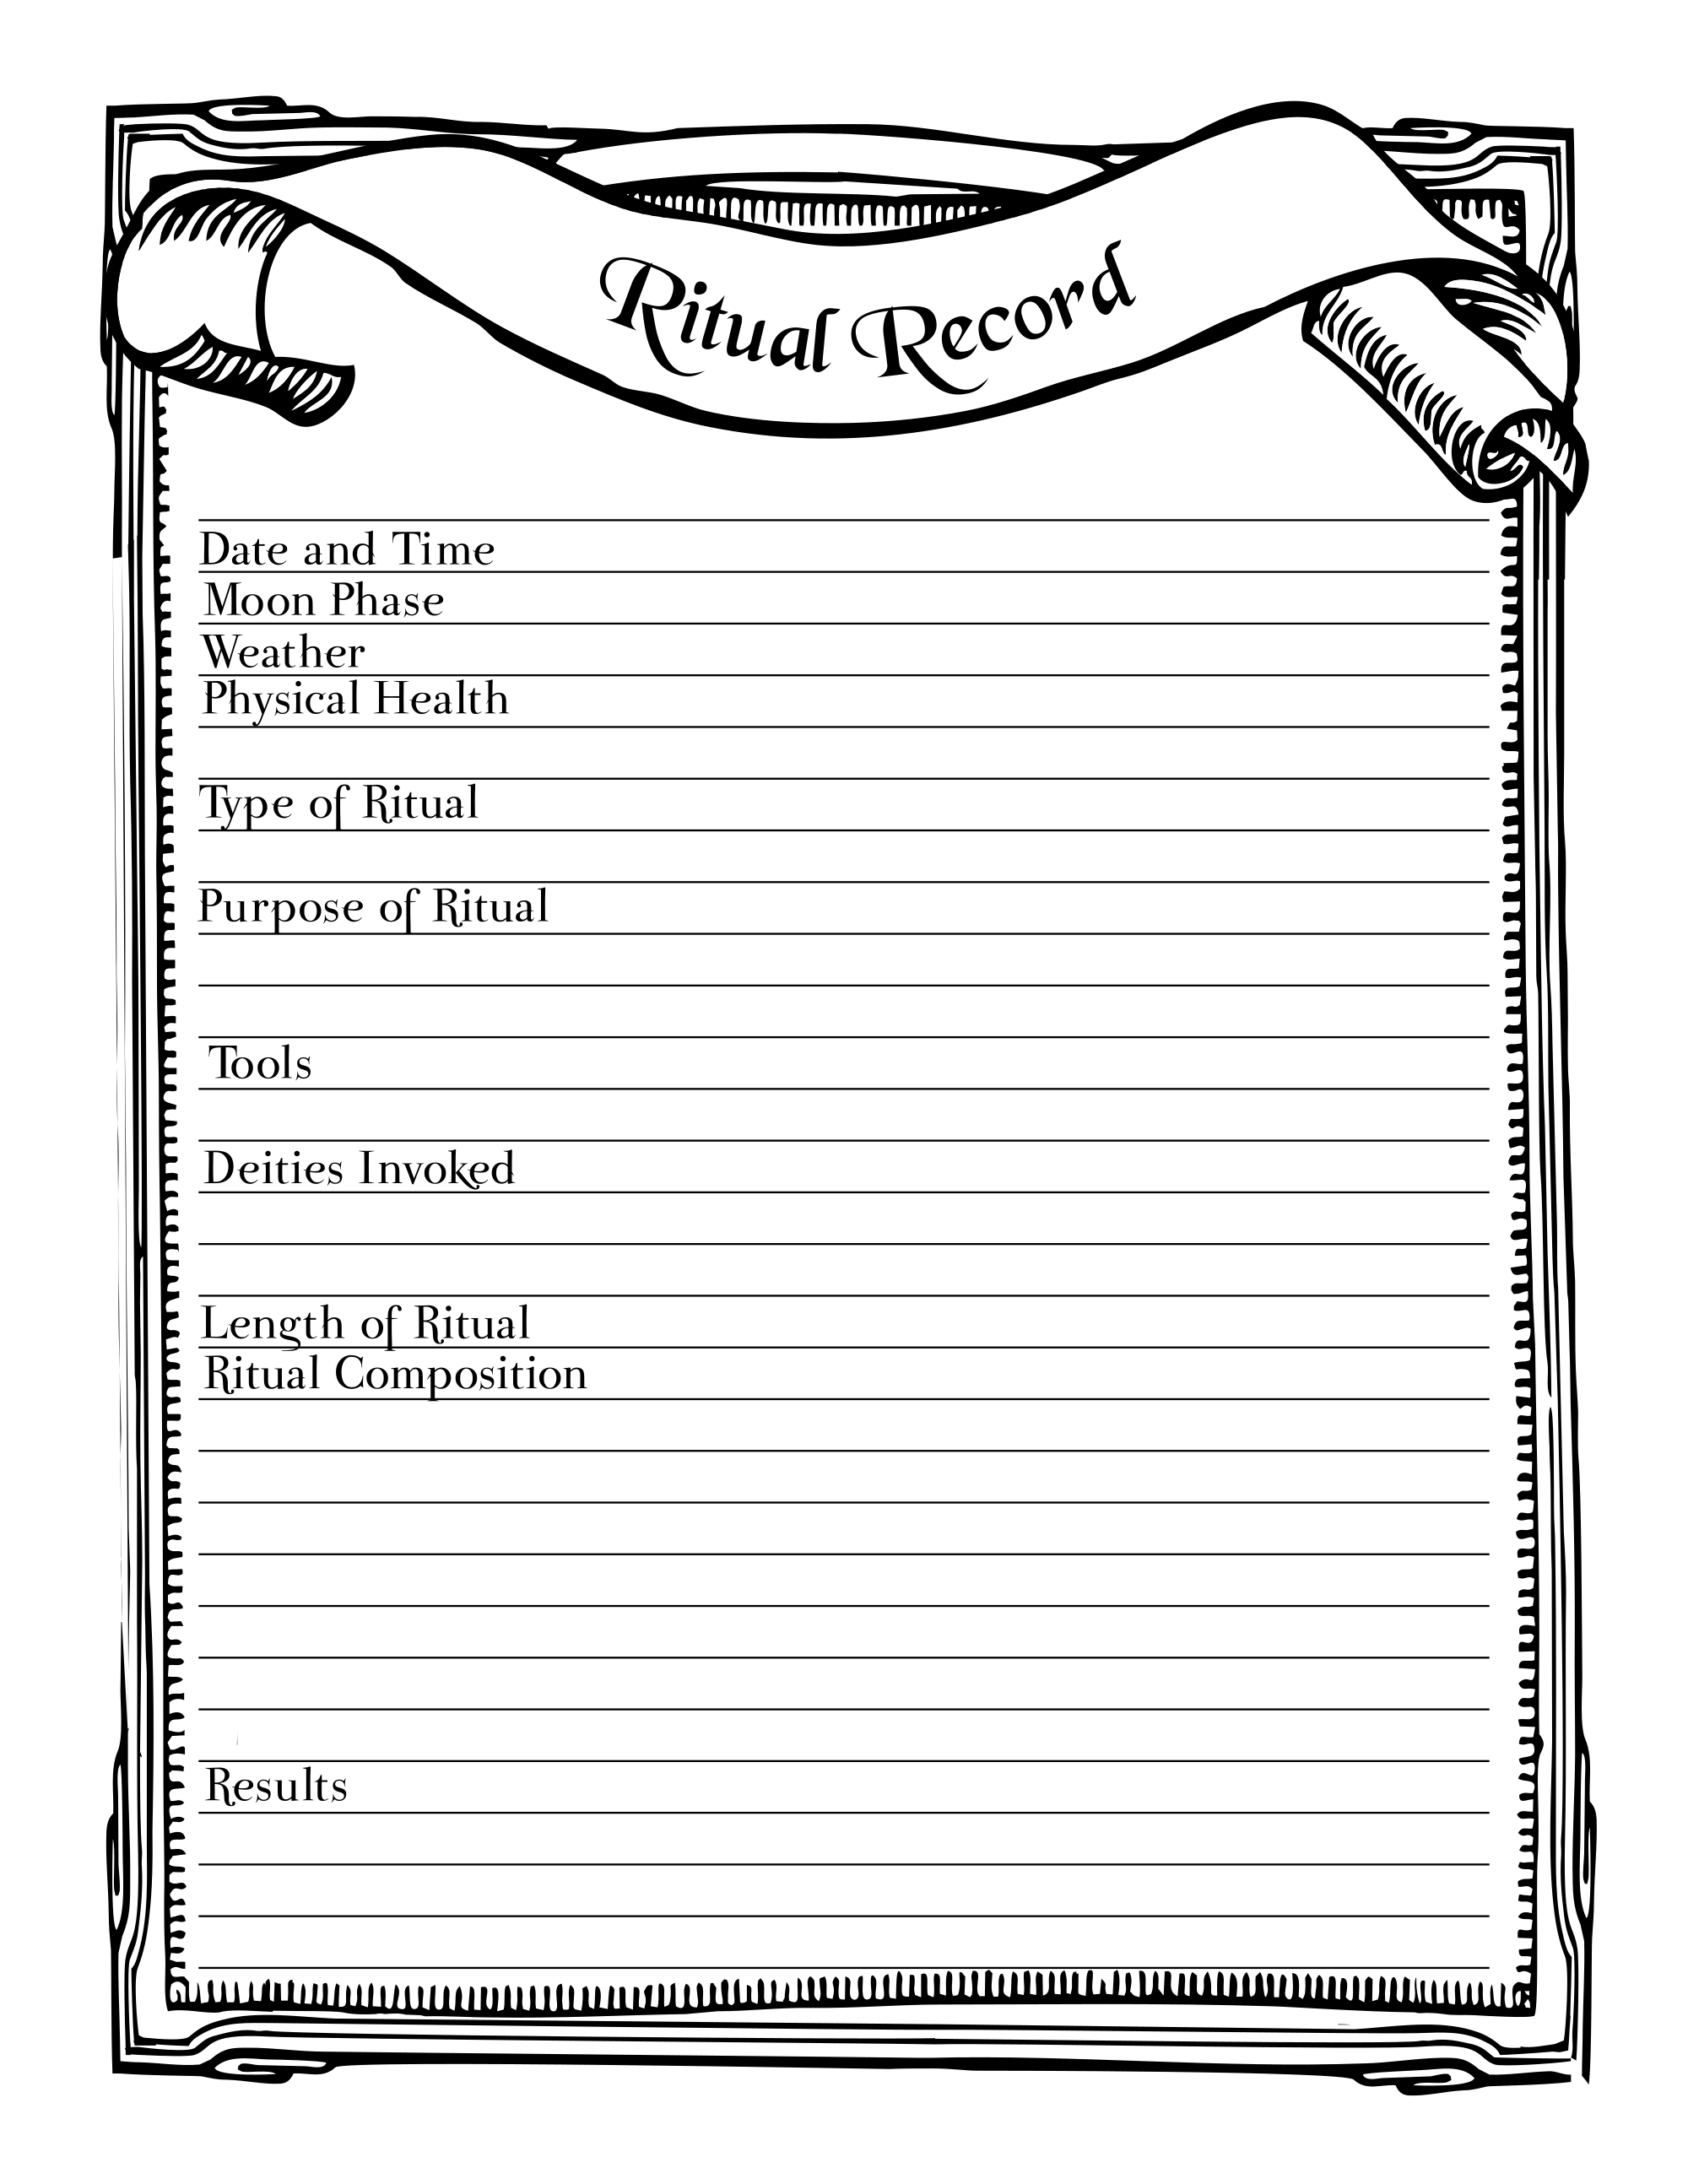 Ritual Record Printable Stationary Page Book Of Shadows